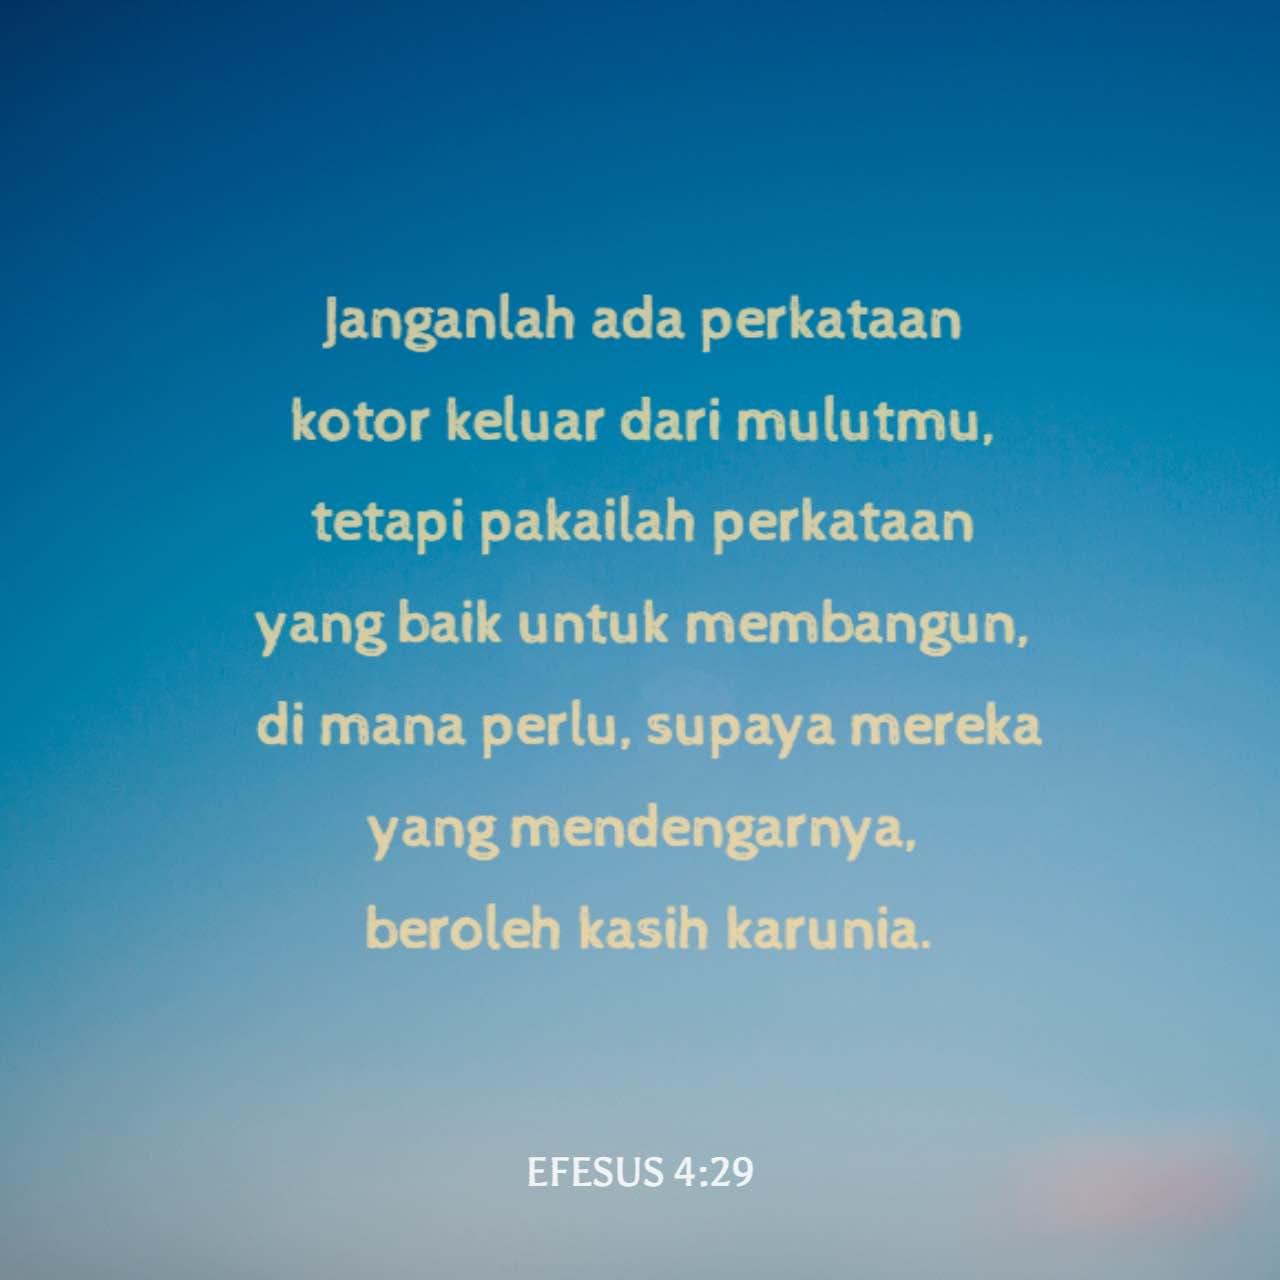 Efesus 4 29 Ketika Kamu Berbicara Janganlah Sampai Kata Kata Kotor Keluar Dari Mulutmu Atau Kata Kata Yang Menyakiti Hati Orang Lain Tetapi Bicaralah Seperlunya Supaya Perkataanmu Menolong Mendatangkan Kebai Terjemahan Sederhana Indonesia Tsi